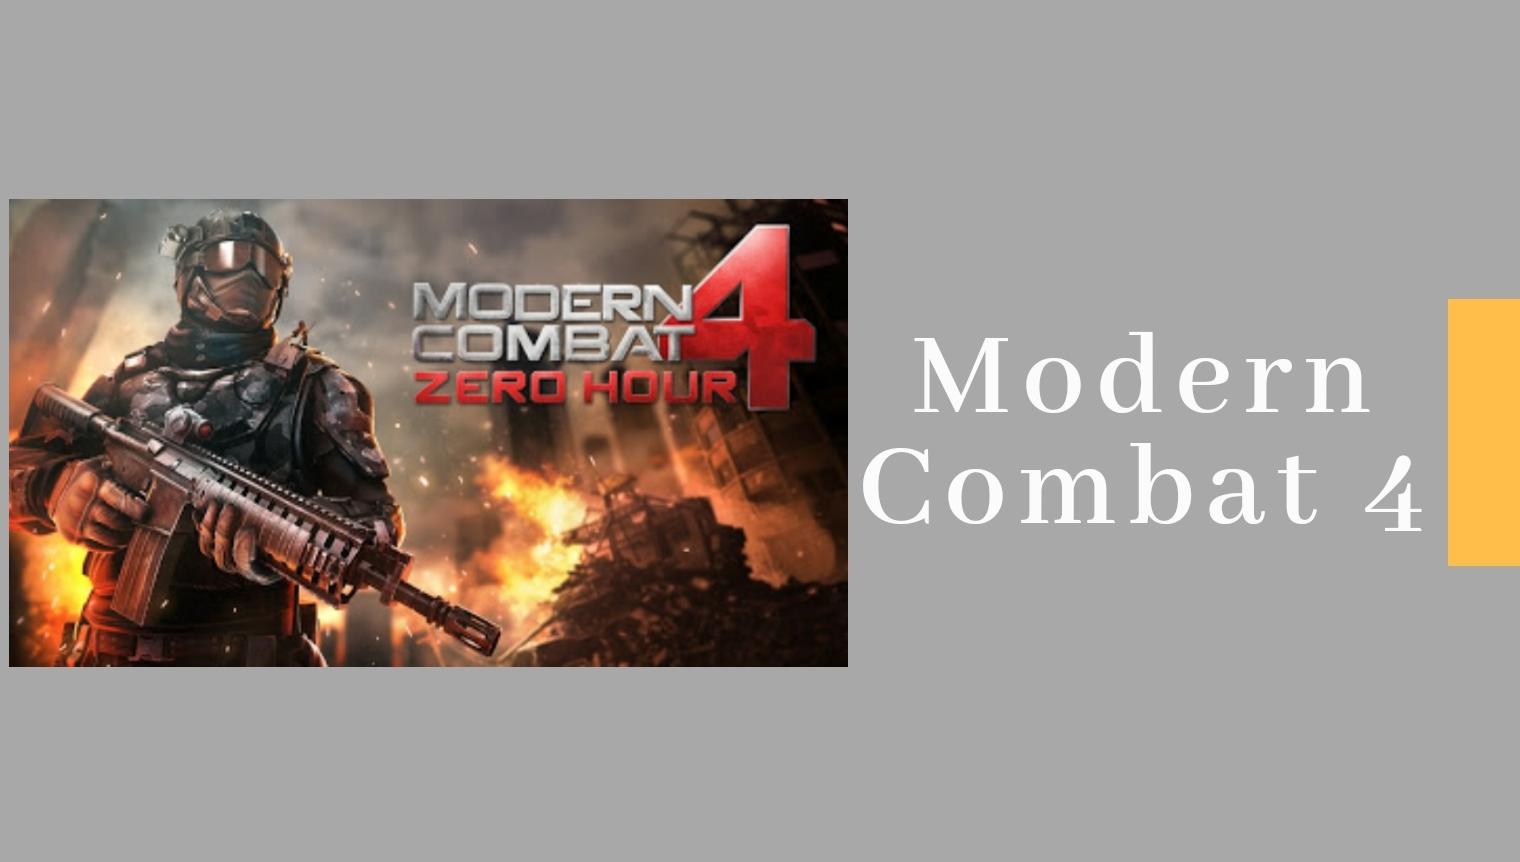 Modern Combat 4 Zero Hour Apk Apkdataobb Com